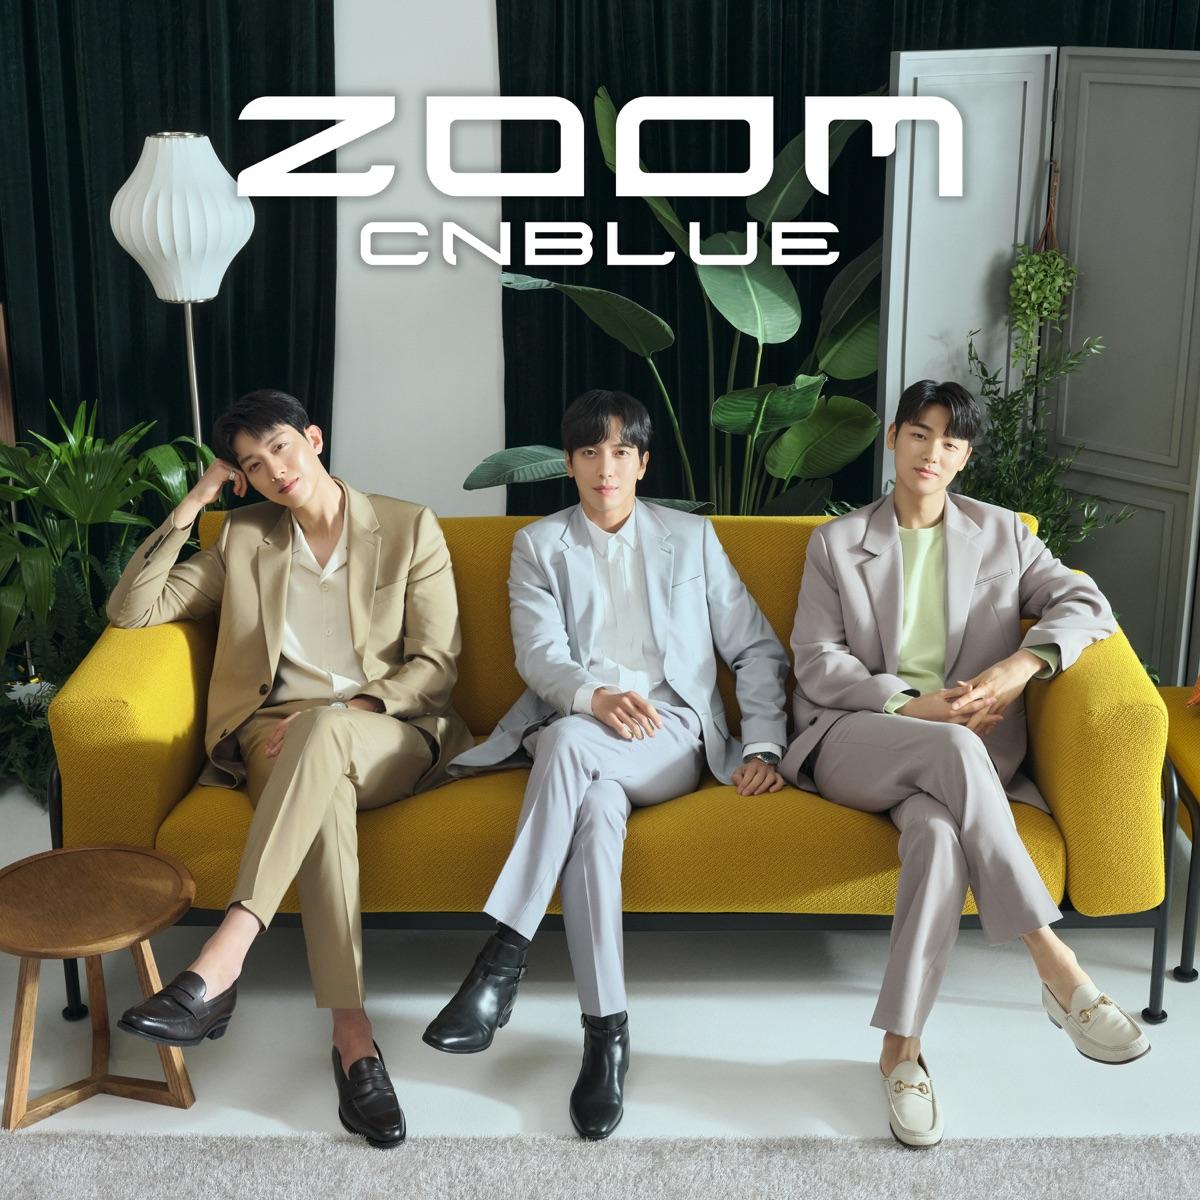 『CNBLUE - ZOOM』収録の『ZOOM』ジャケット